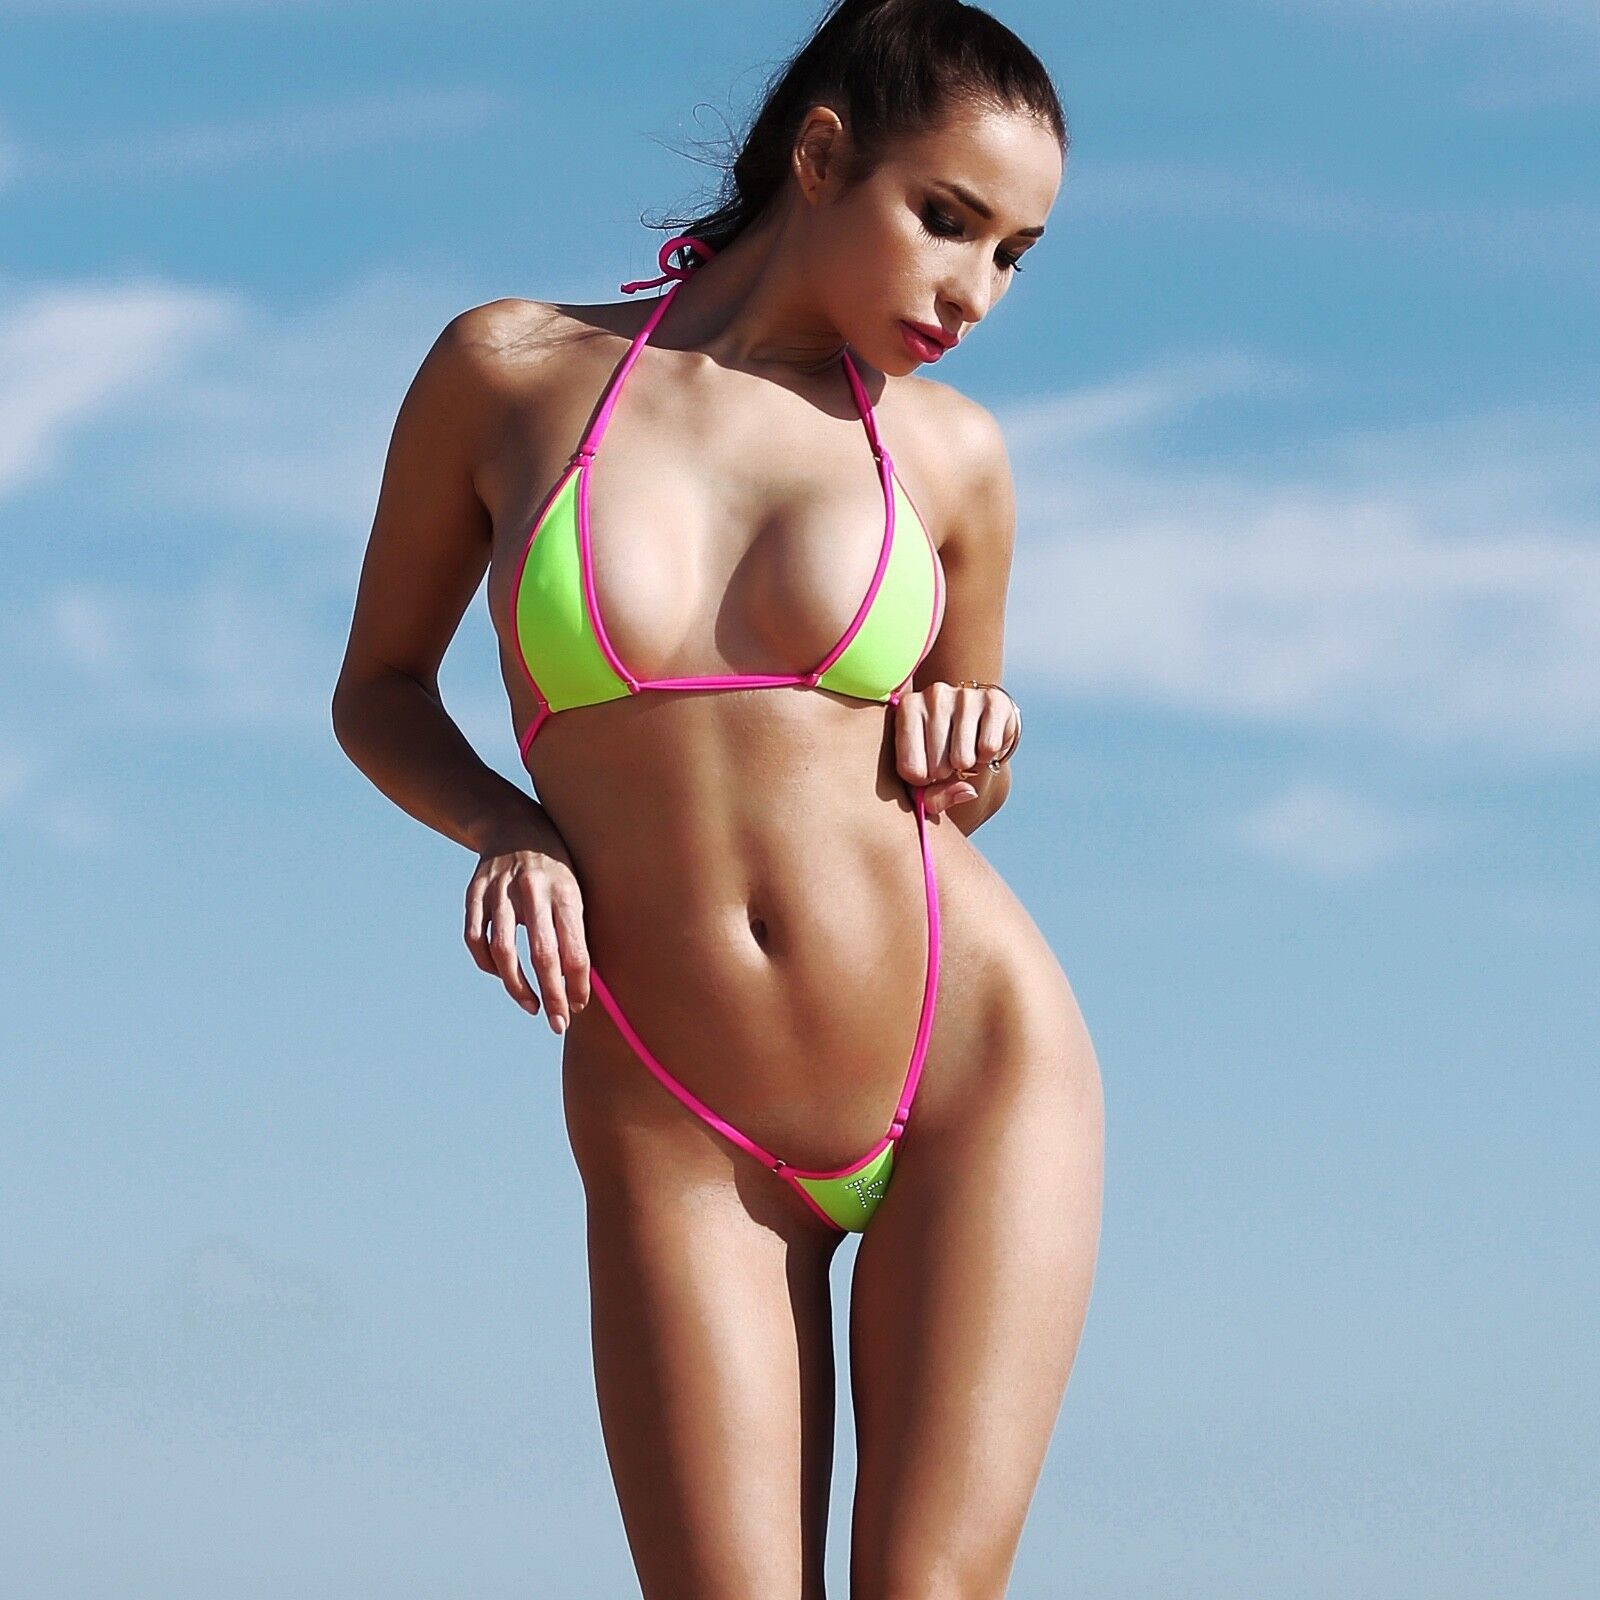 TS Hot Sexy cute Micro Bikini Extreme String Two Piece Mini Swimsuit Thong Set